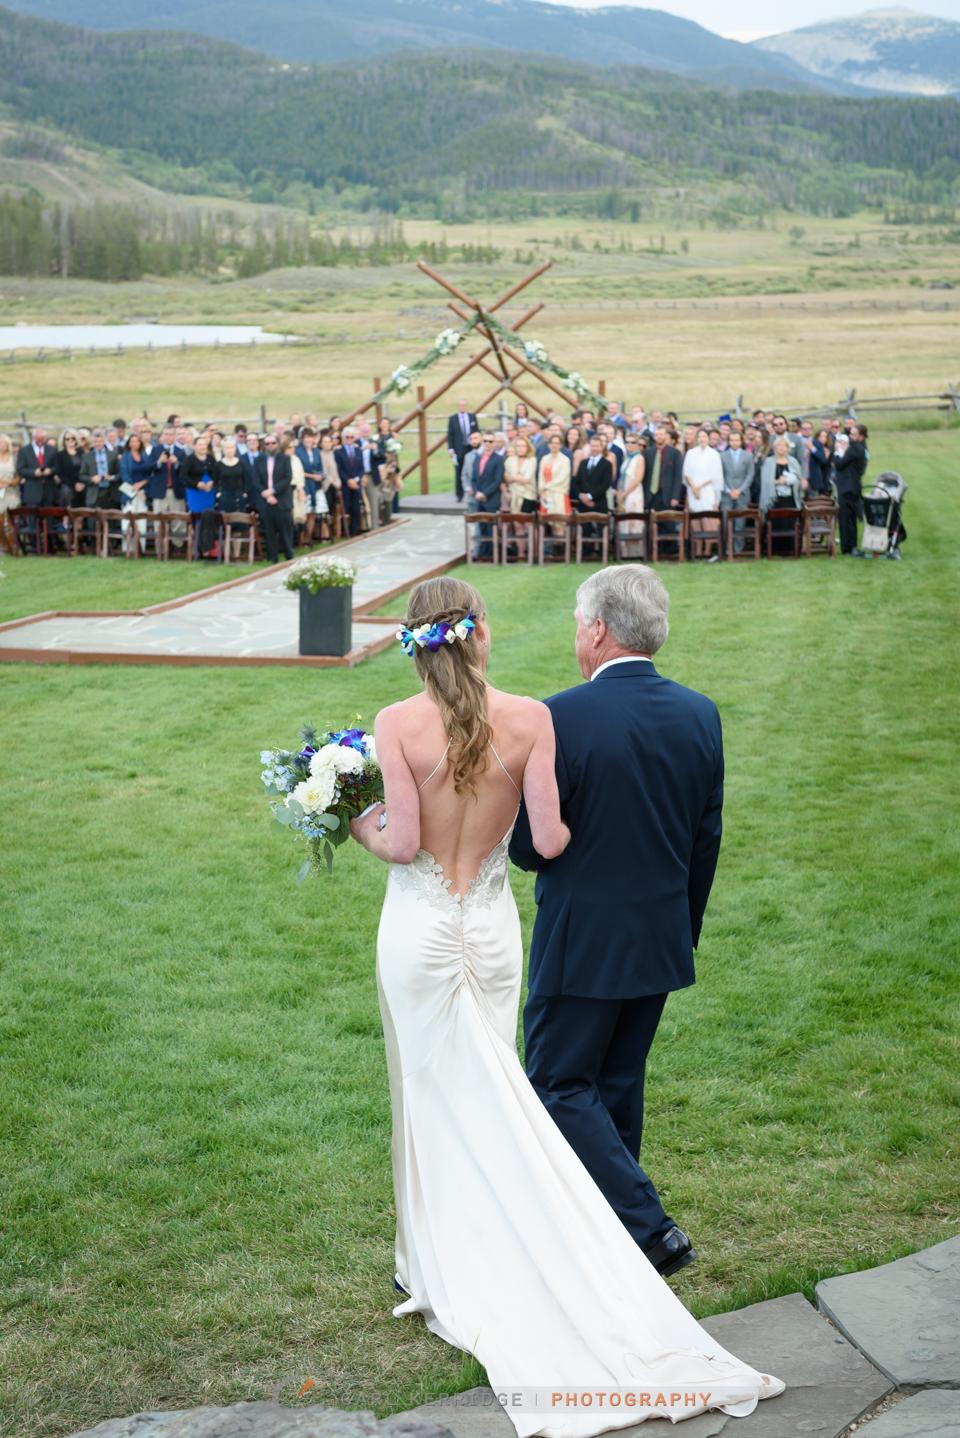 carl-kerridge-photography-wedding-devils-thumb-ranch-colorado-26